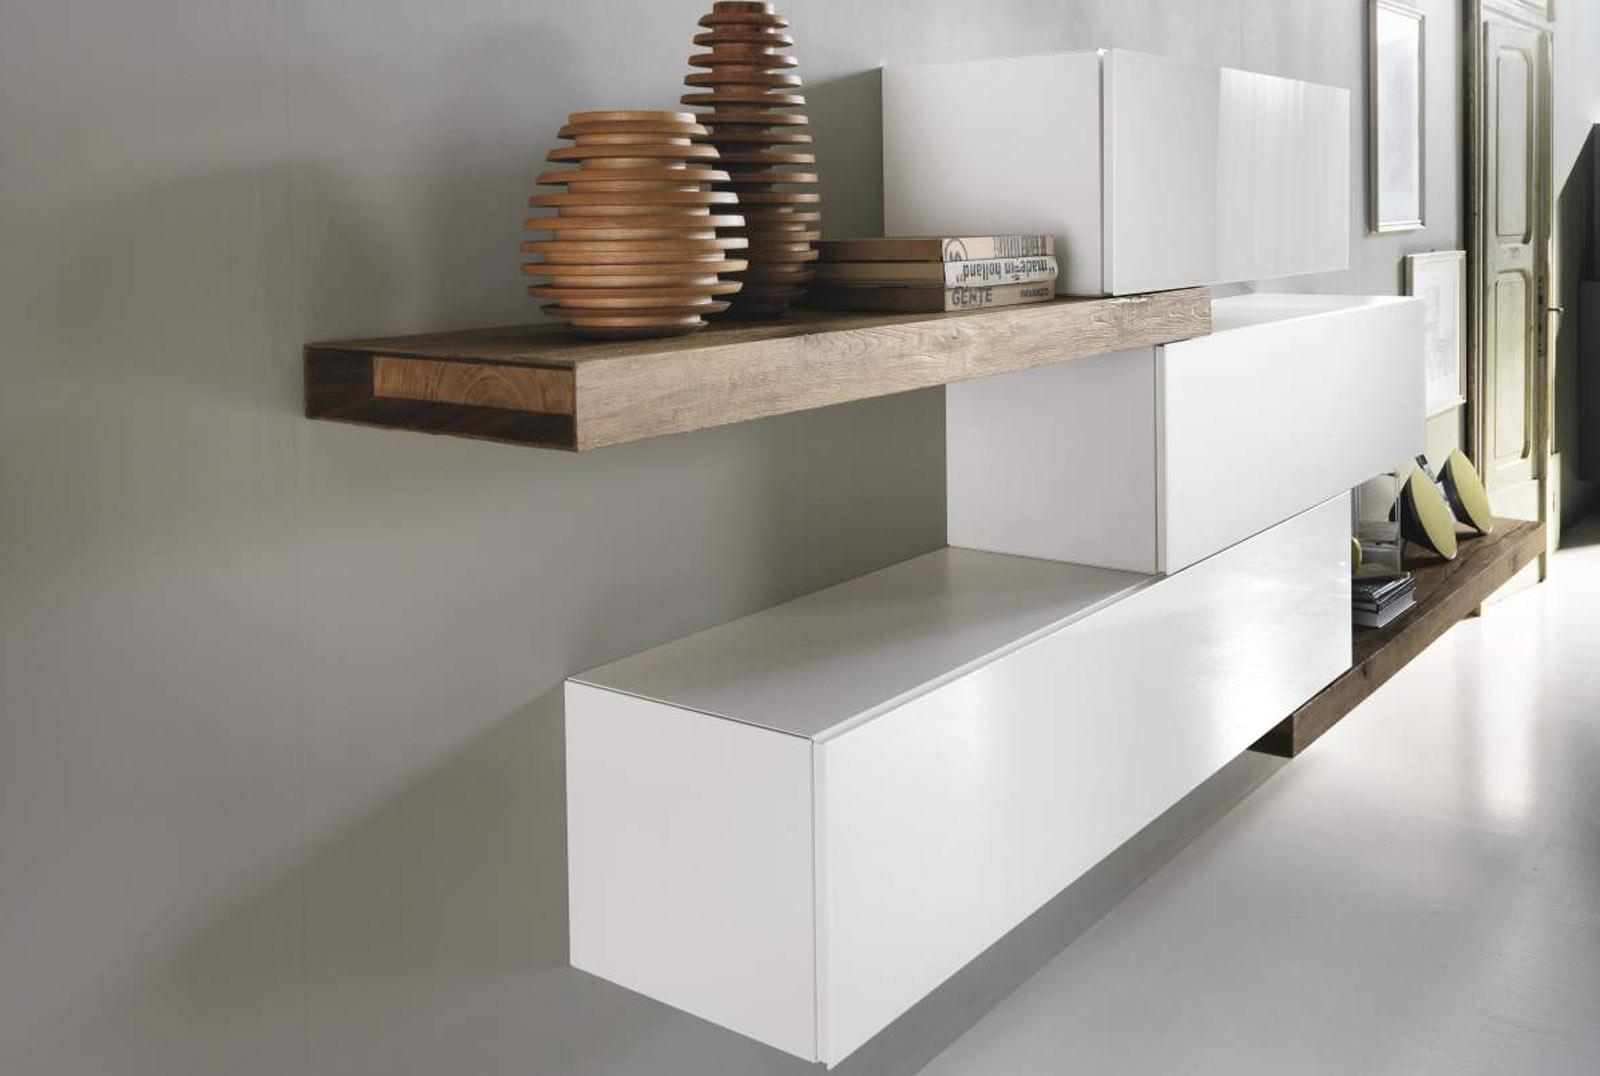 etag res et rangements meubles design mobilier et. Black Bedroom Furniture Sets. Home Design Ideas